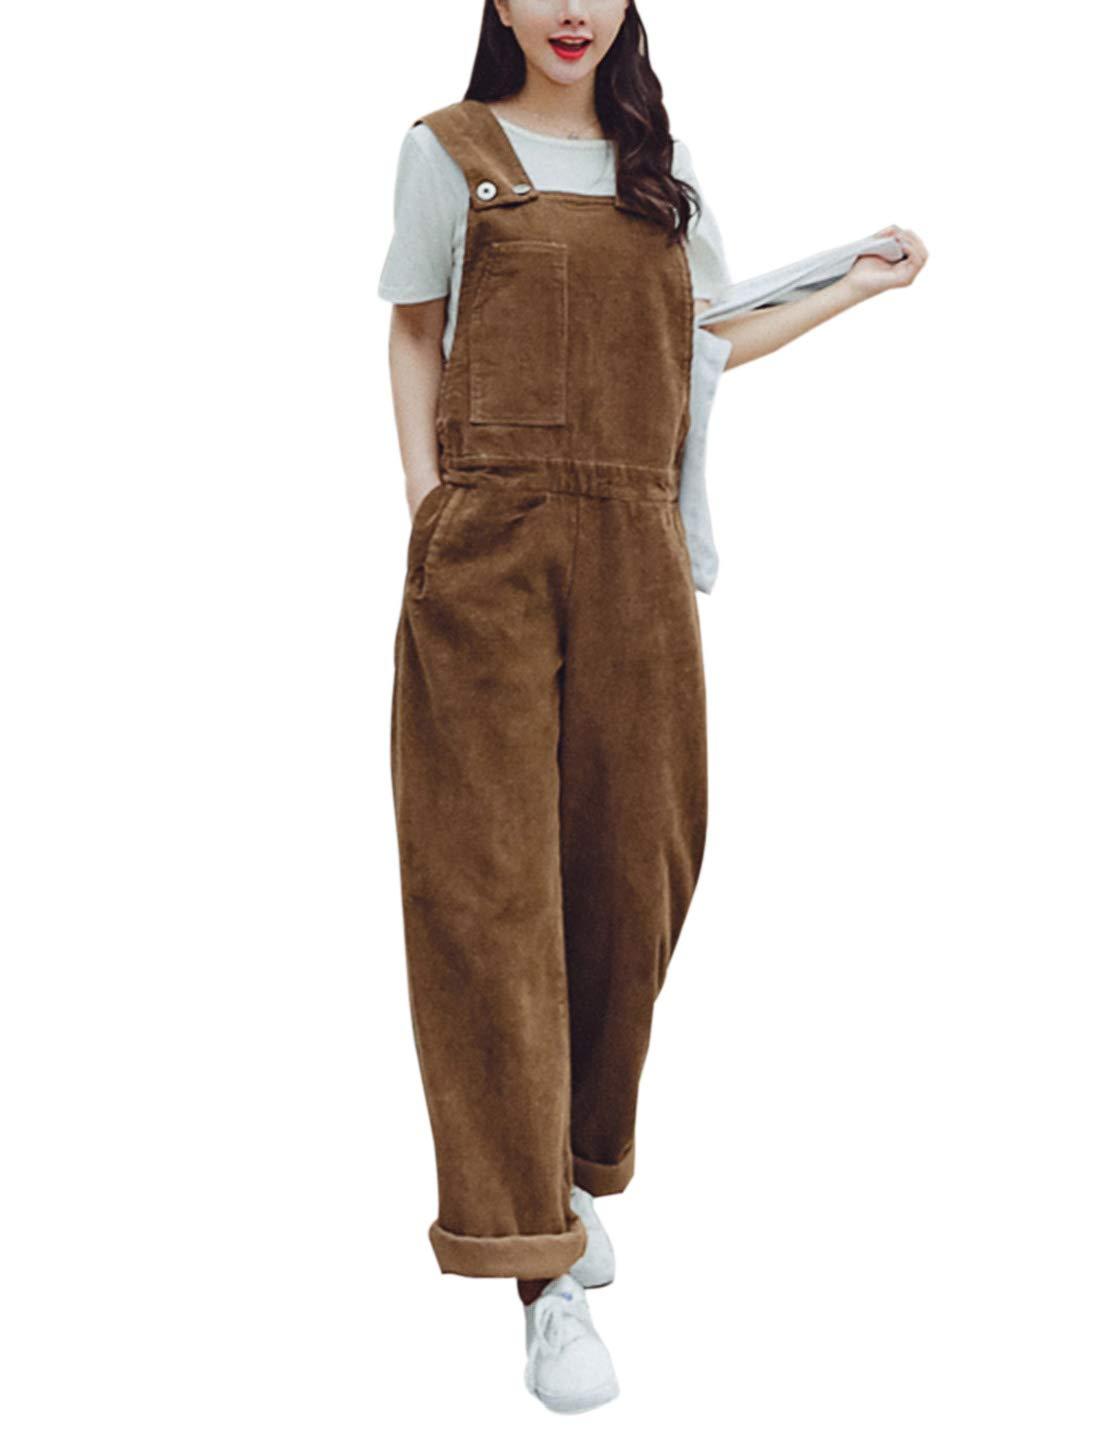 Gihuo Women's Baggy Wide Leg Loose Corduroy Bib Overalls (Coffee, X-Large) by Gihuo (Image #1)